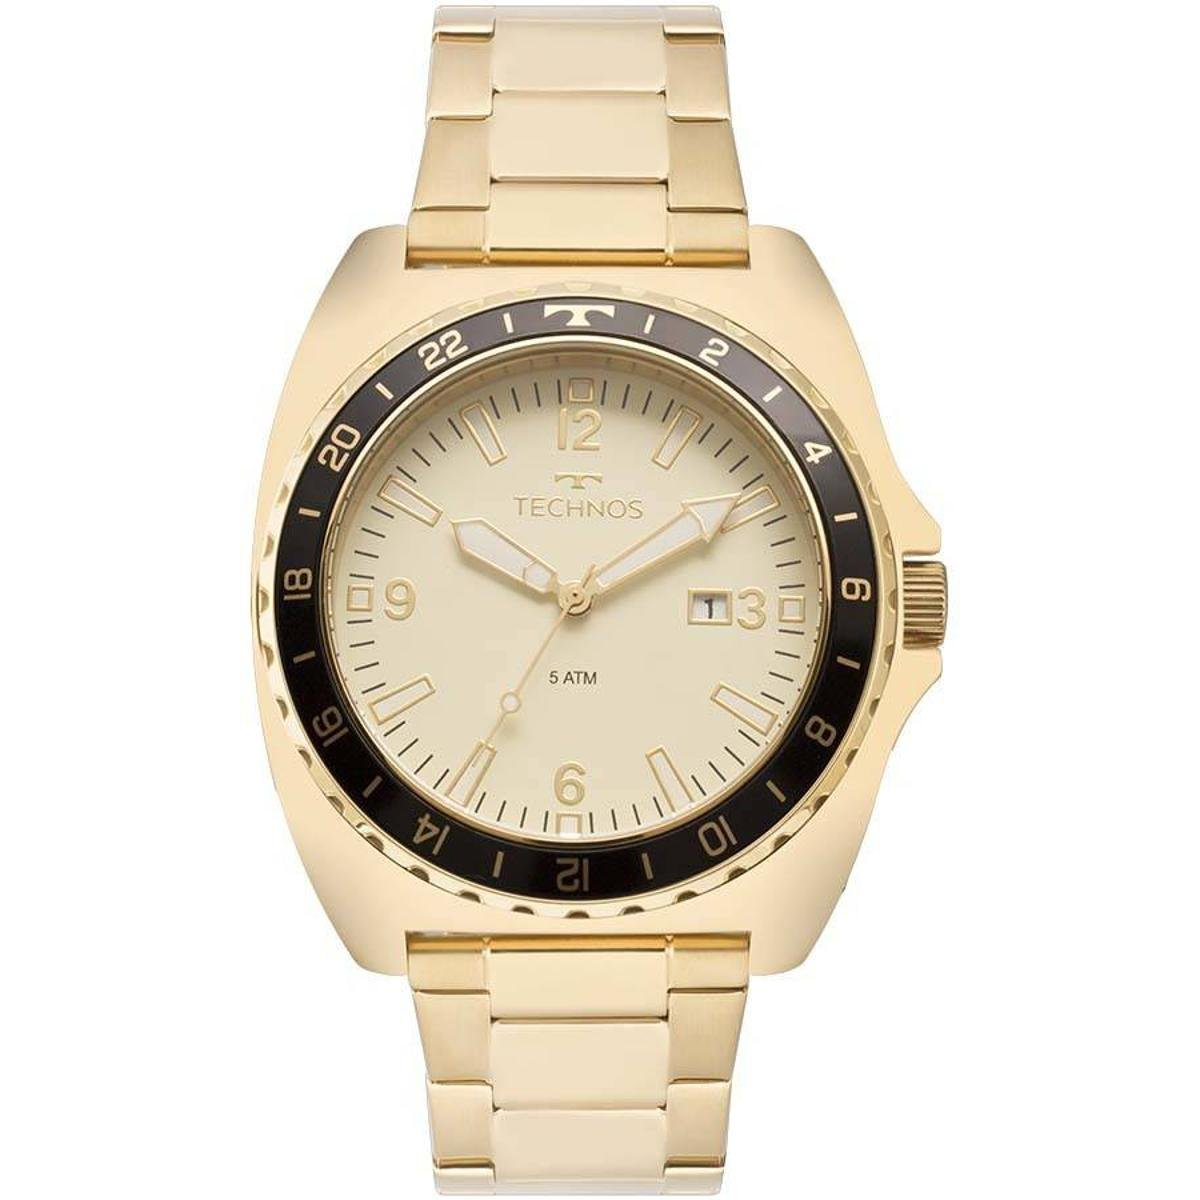 Relógio Technos Masculino Racer - Dourado - Compre Agora   Zattini 9f057fae97